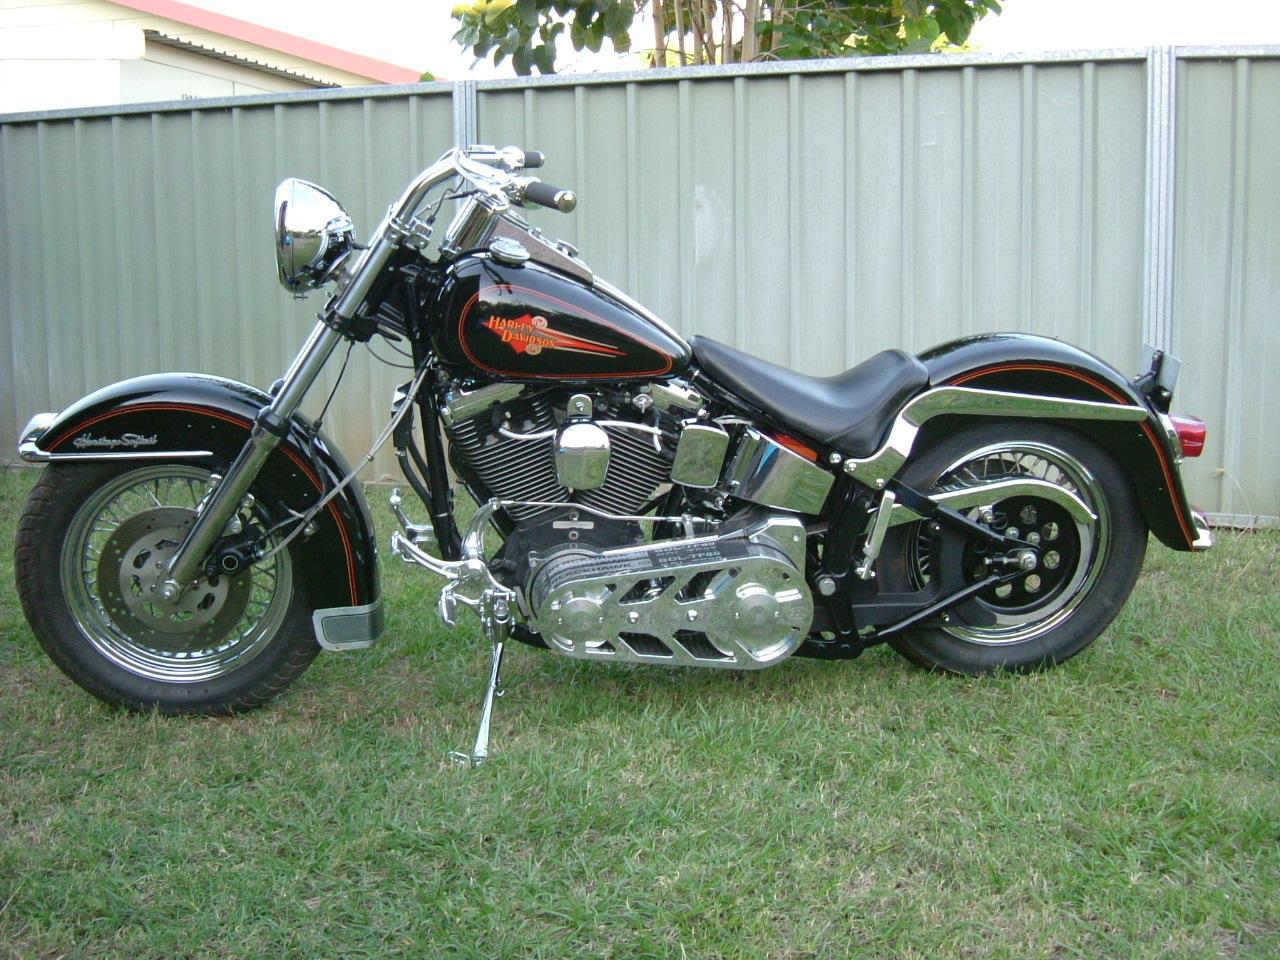 Harley Davidson Flstc Heritage Softail Classic Photos